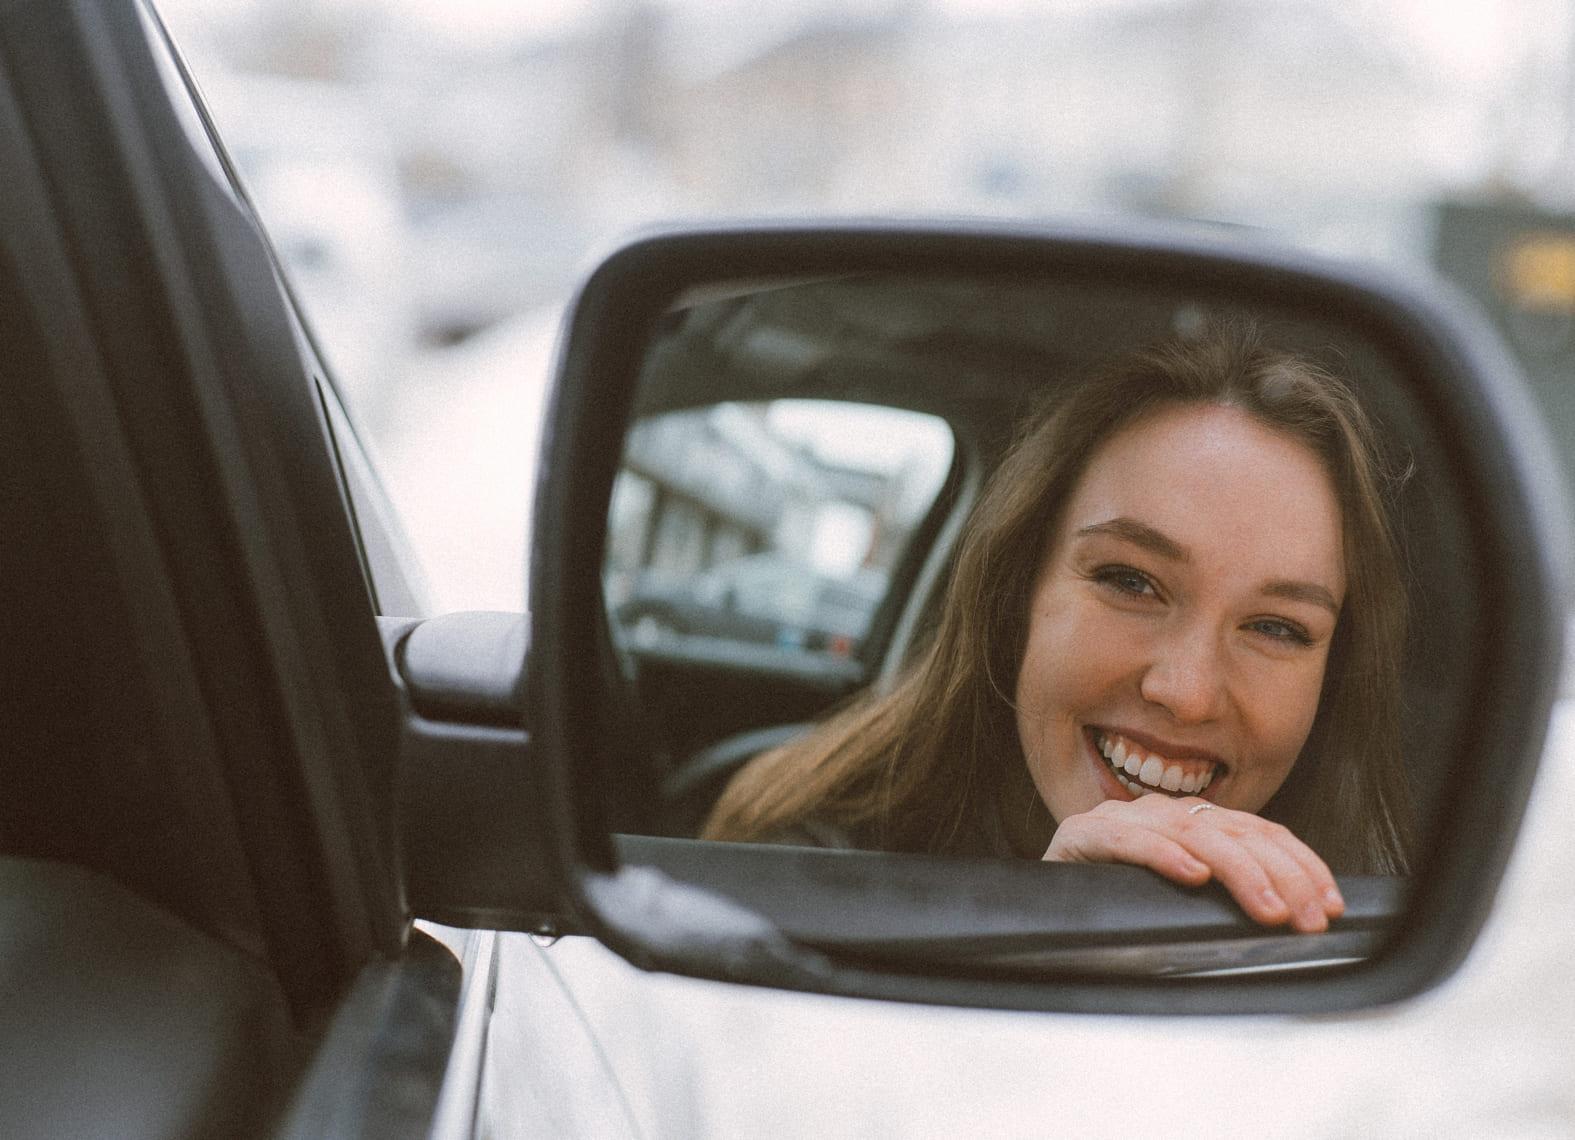 Vrouw in autospiegel